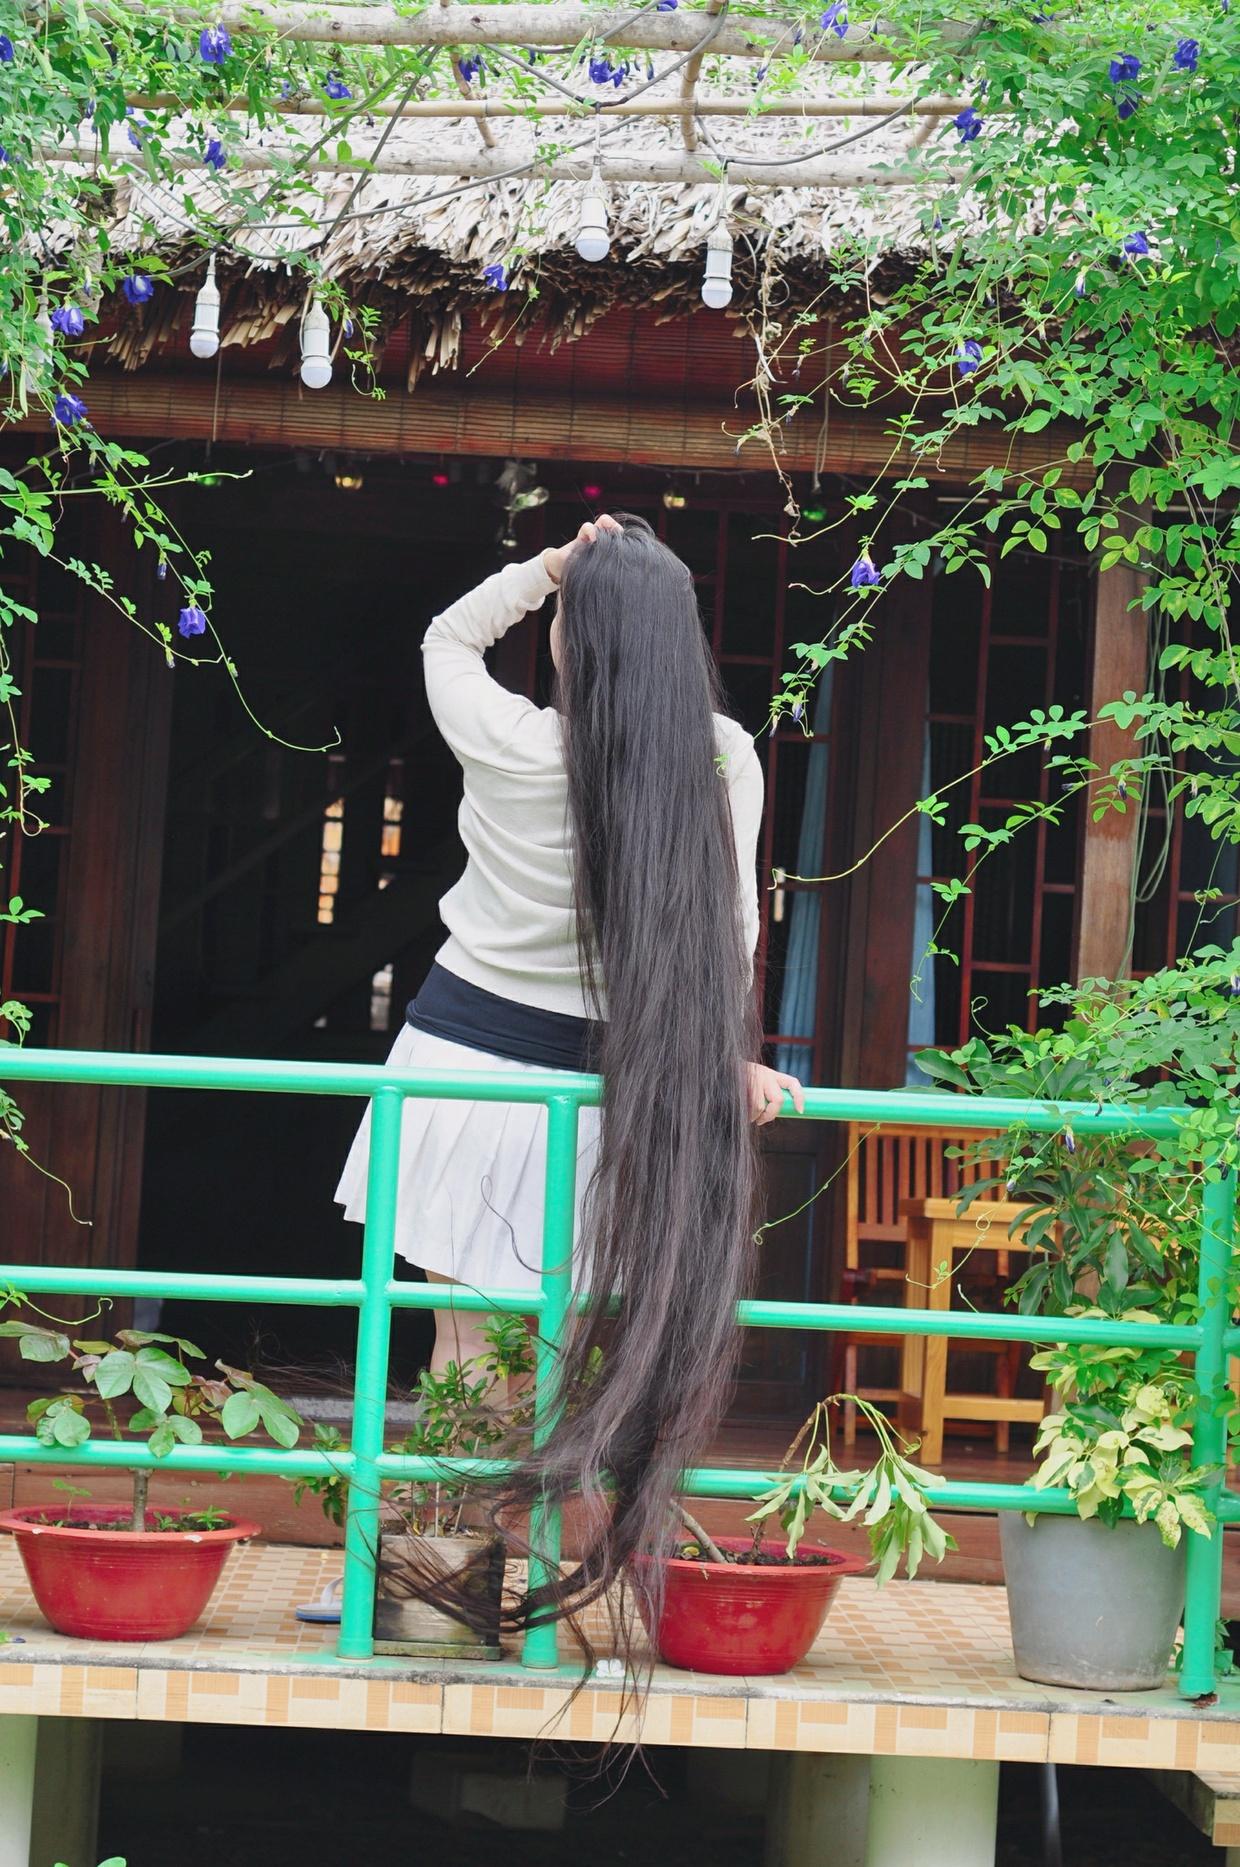 Set My Hair Free In A Beautiful Garden